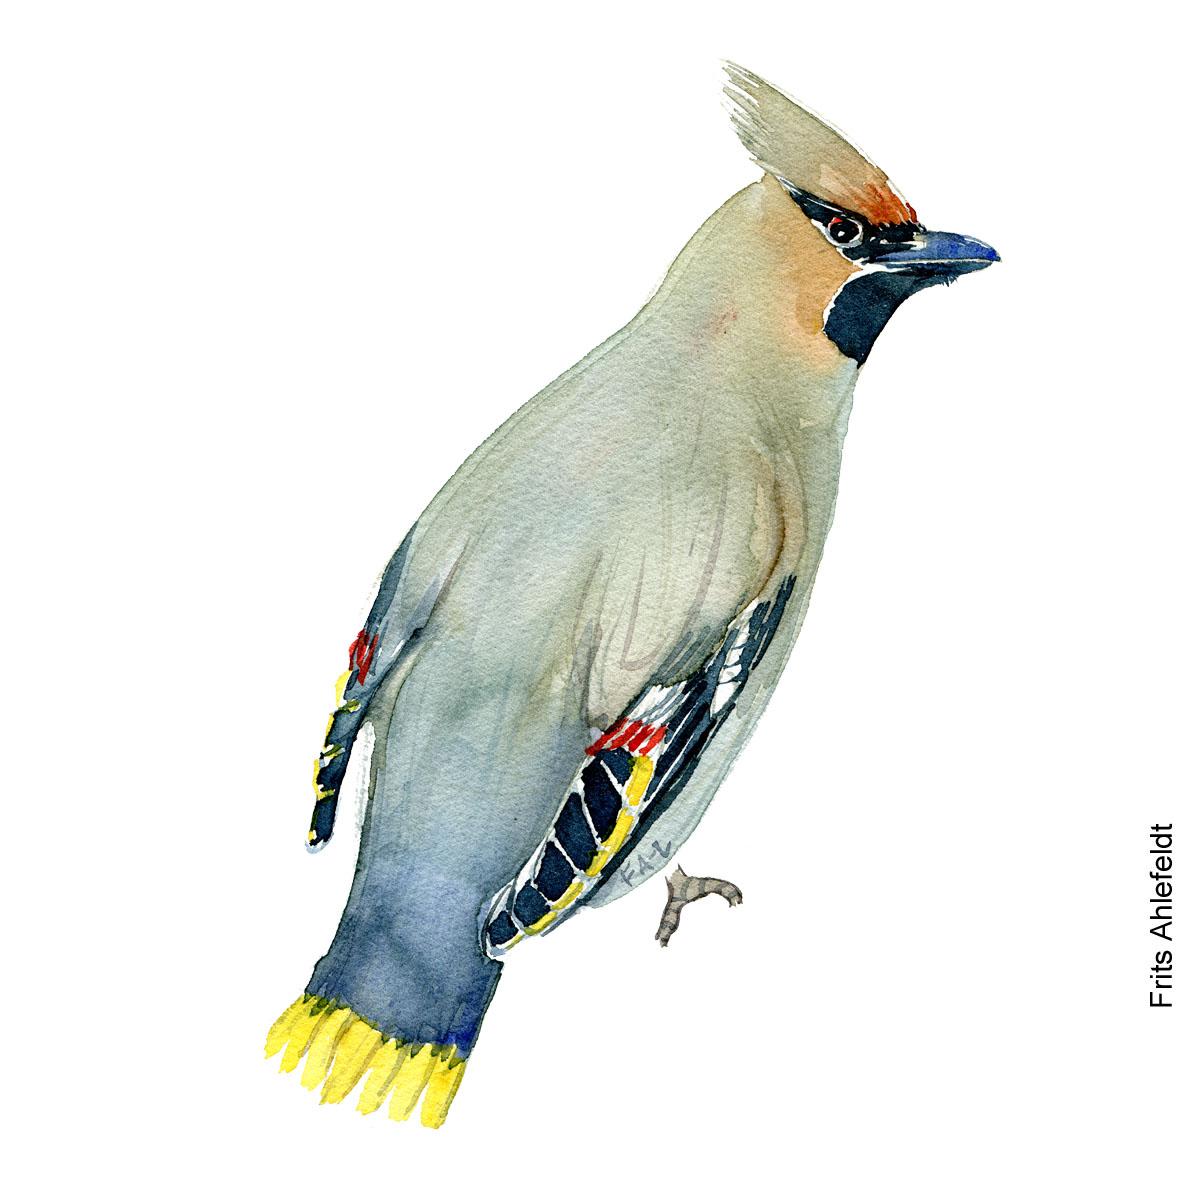 Dw00211 Silkehale - Bohemian waxwing bird watercolor. Akvarel af Frits Ahlefeldt